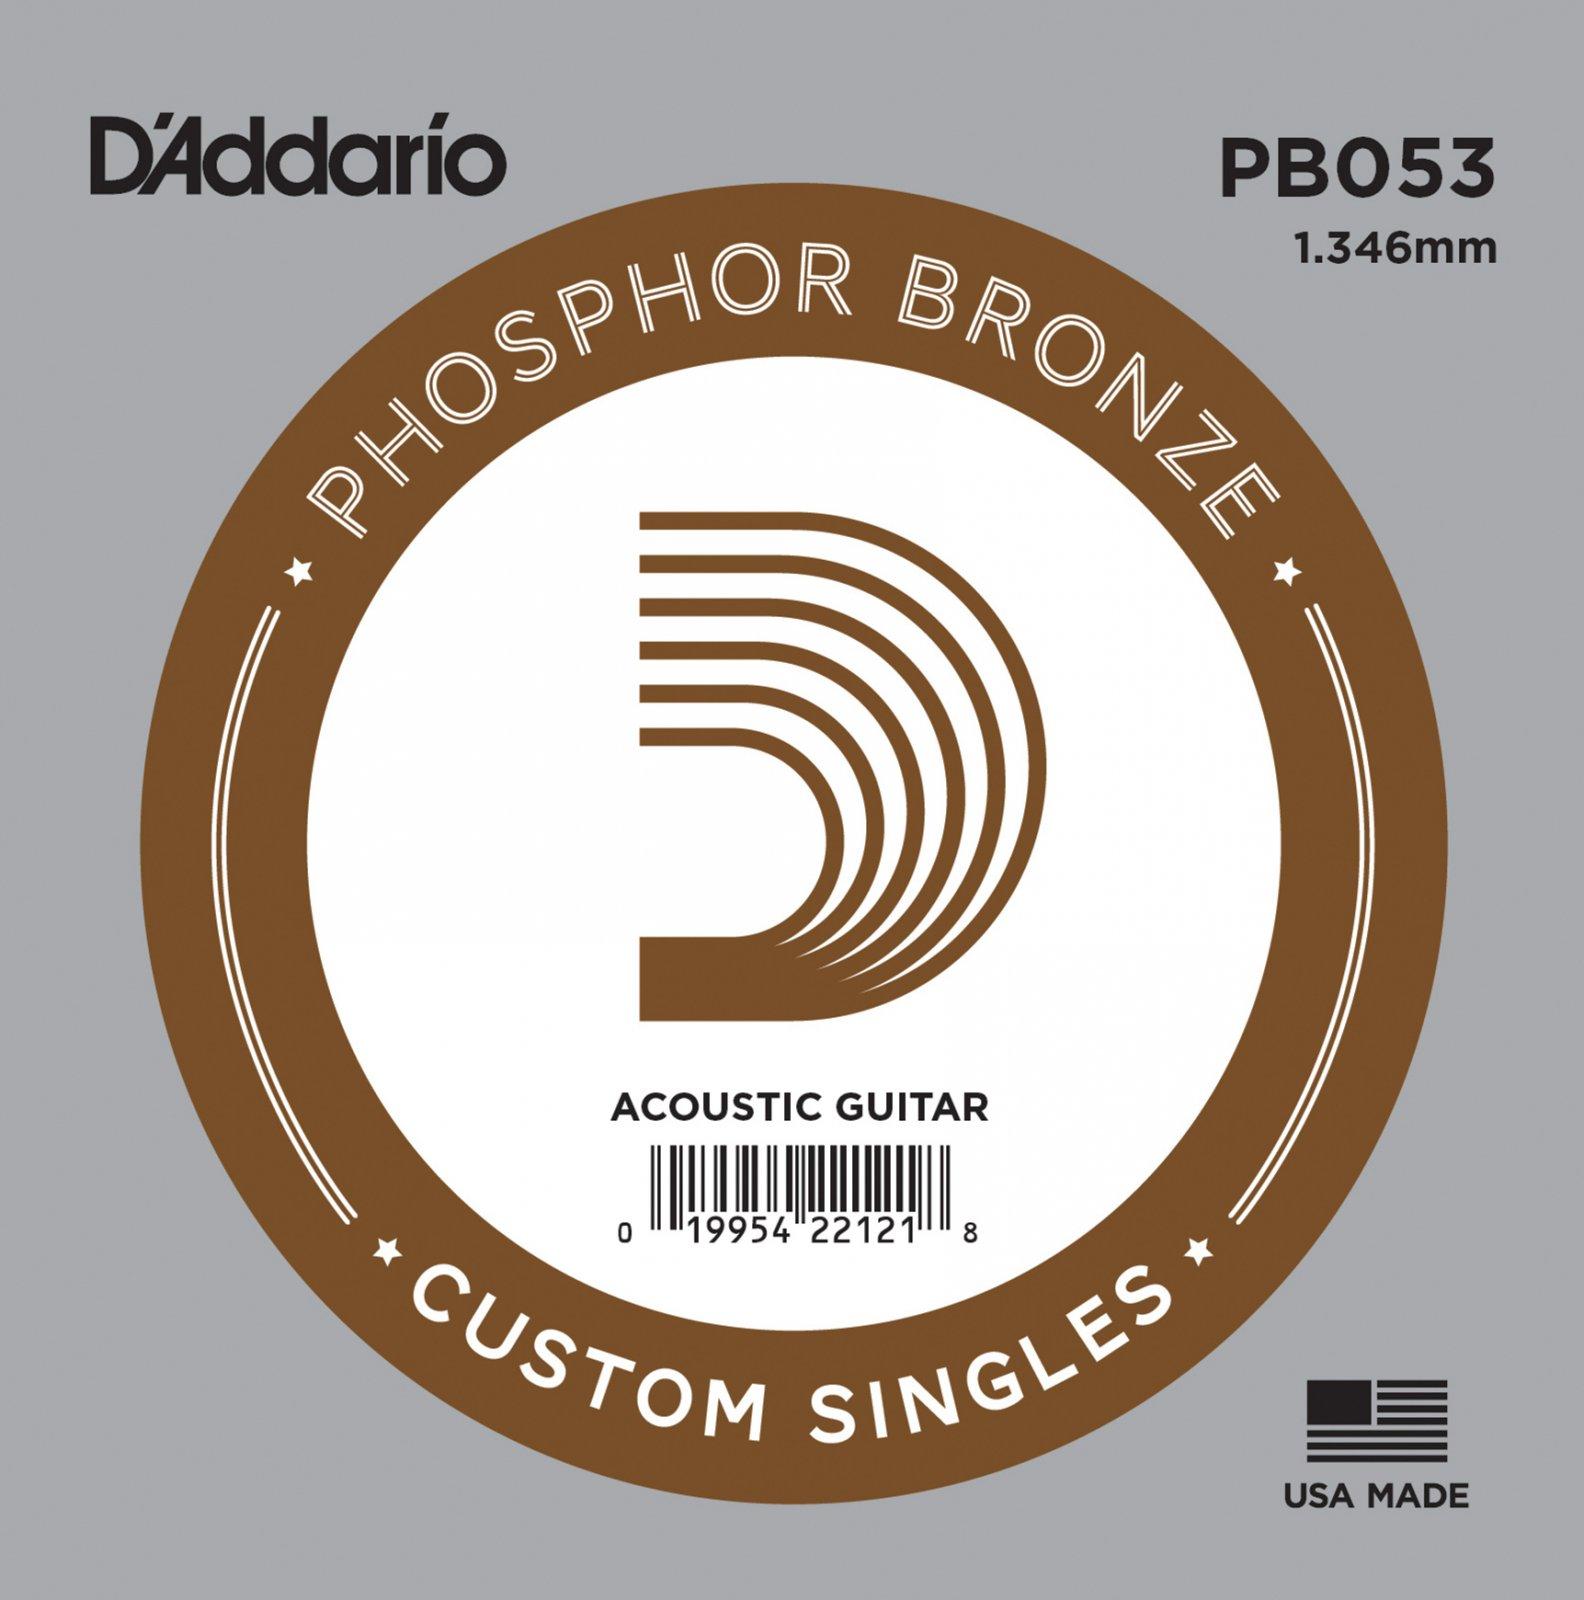 D'Addario .053 Phosphor Bronze Acoustic Guitar String